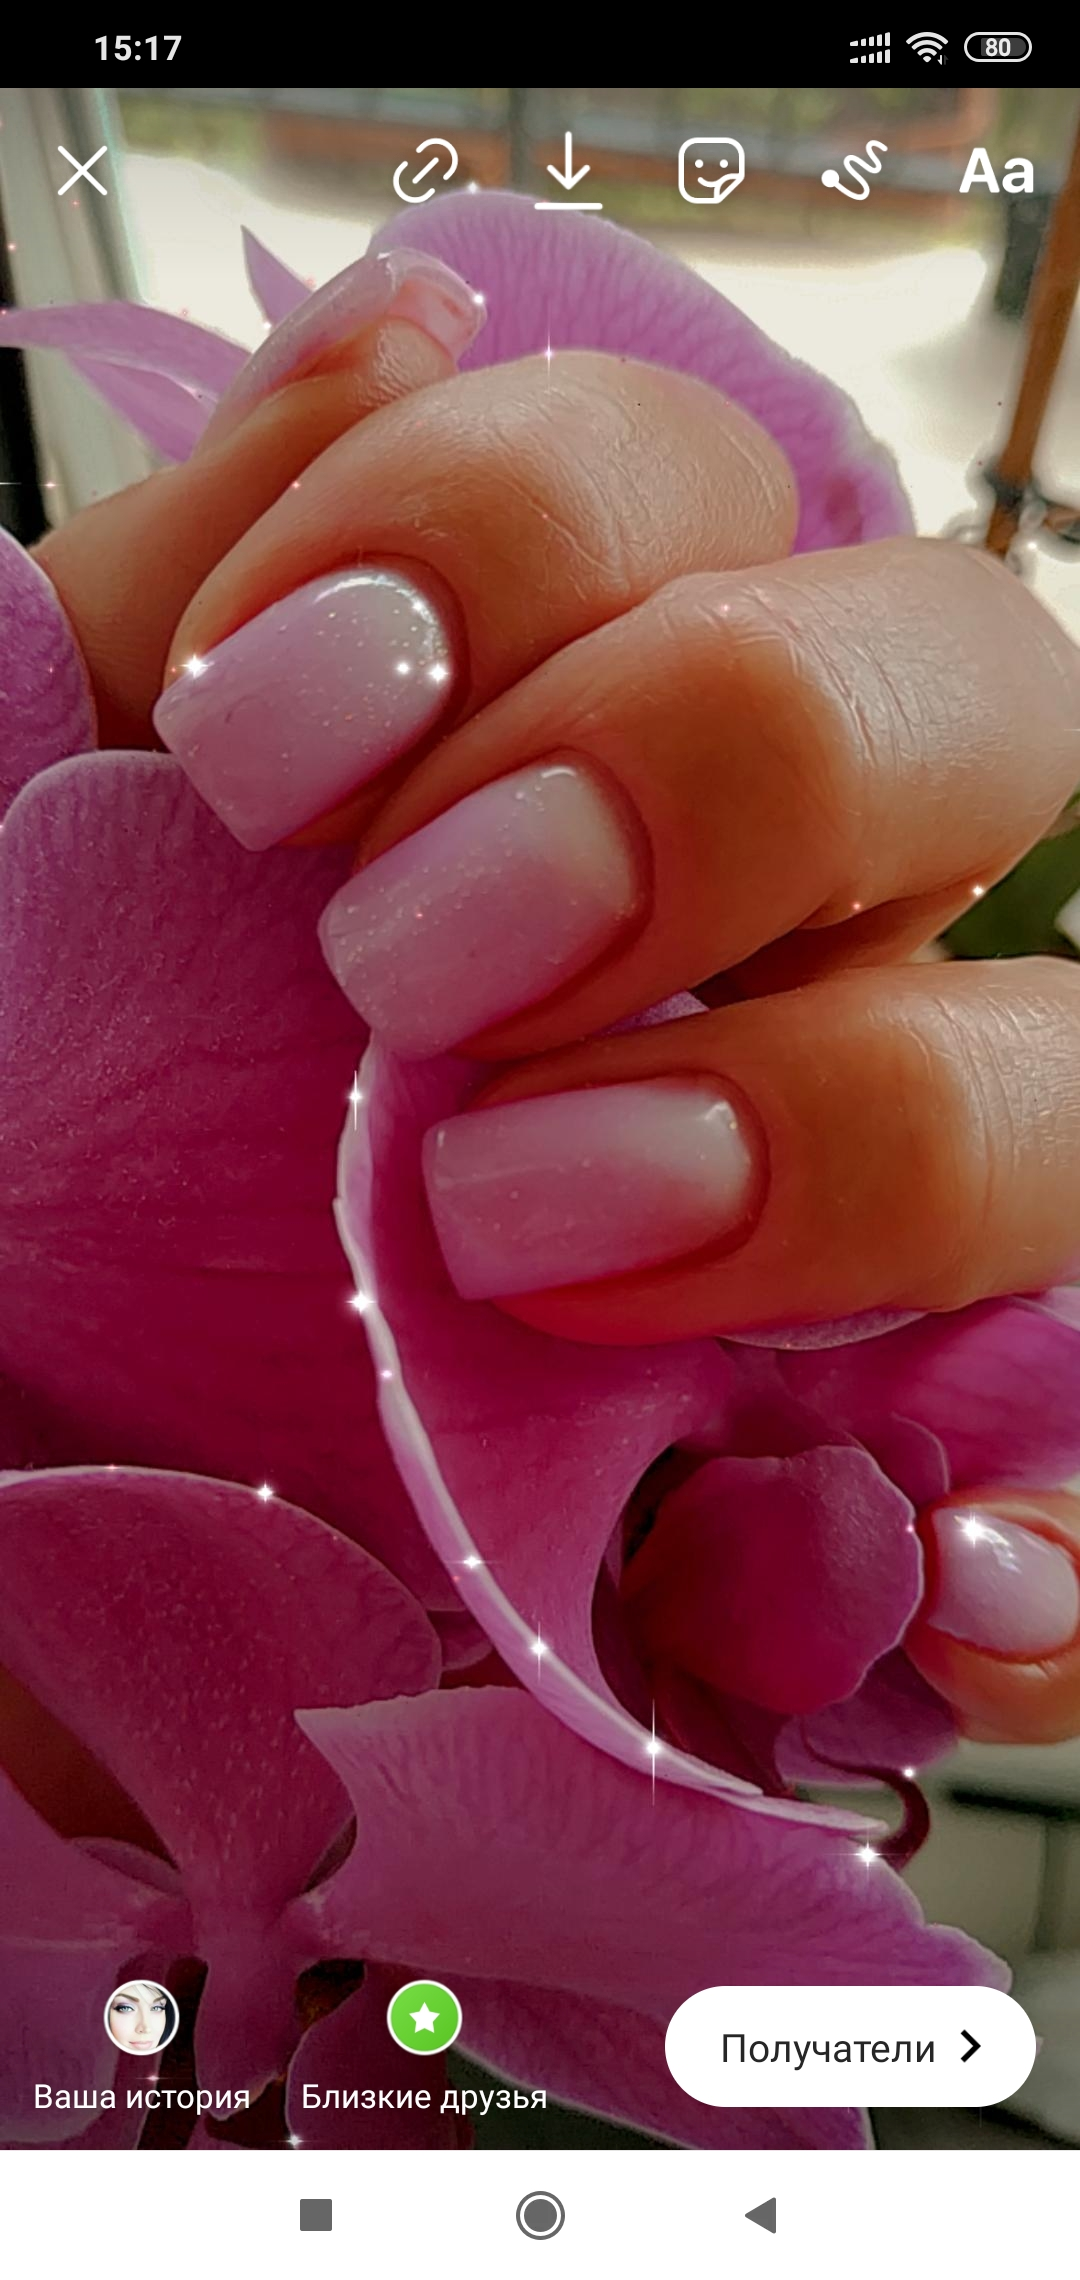 Маникюр с блестками в розовом цвете на короткие ногти.